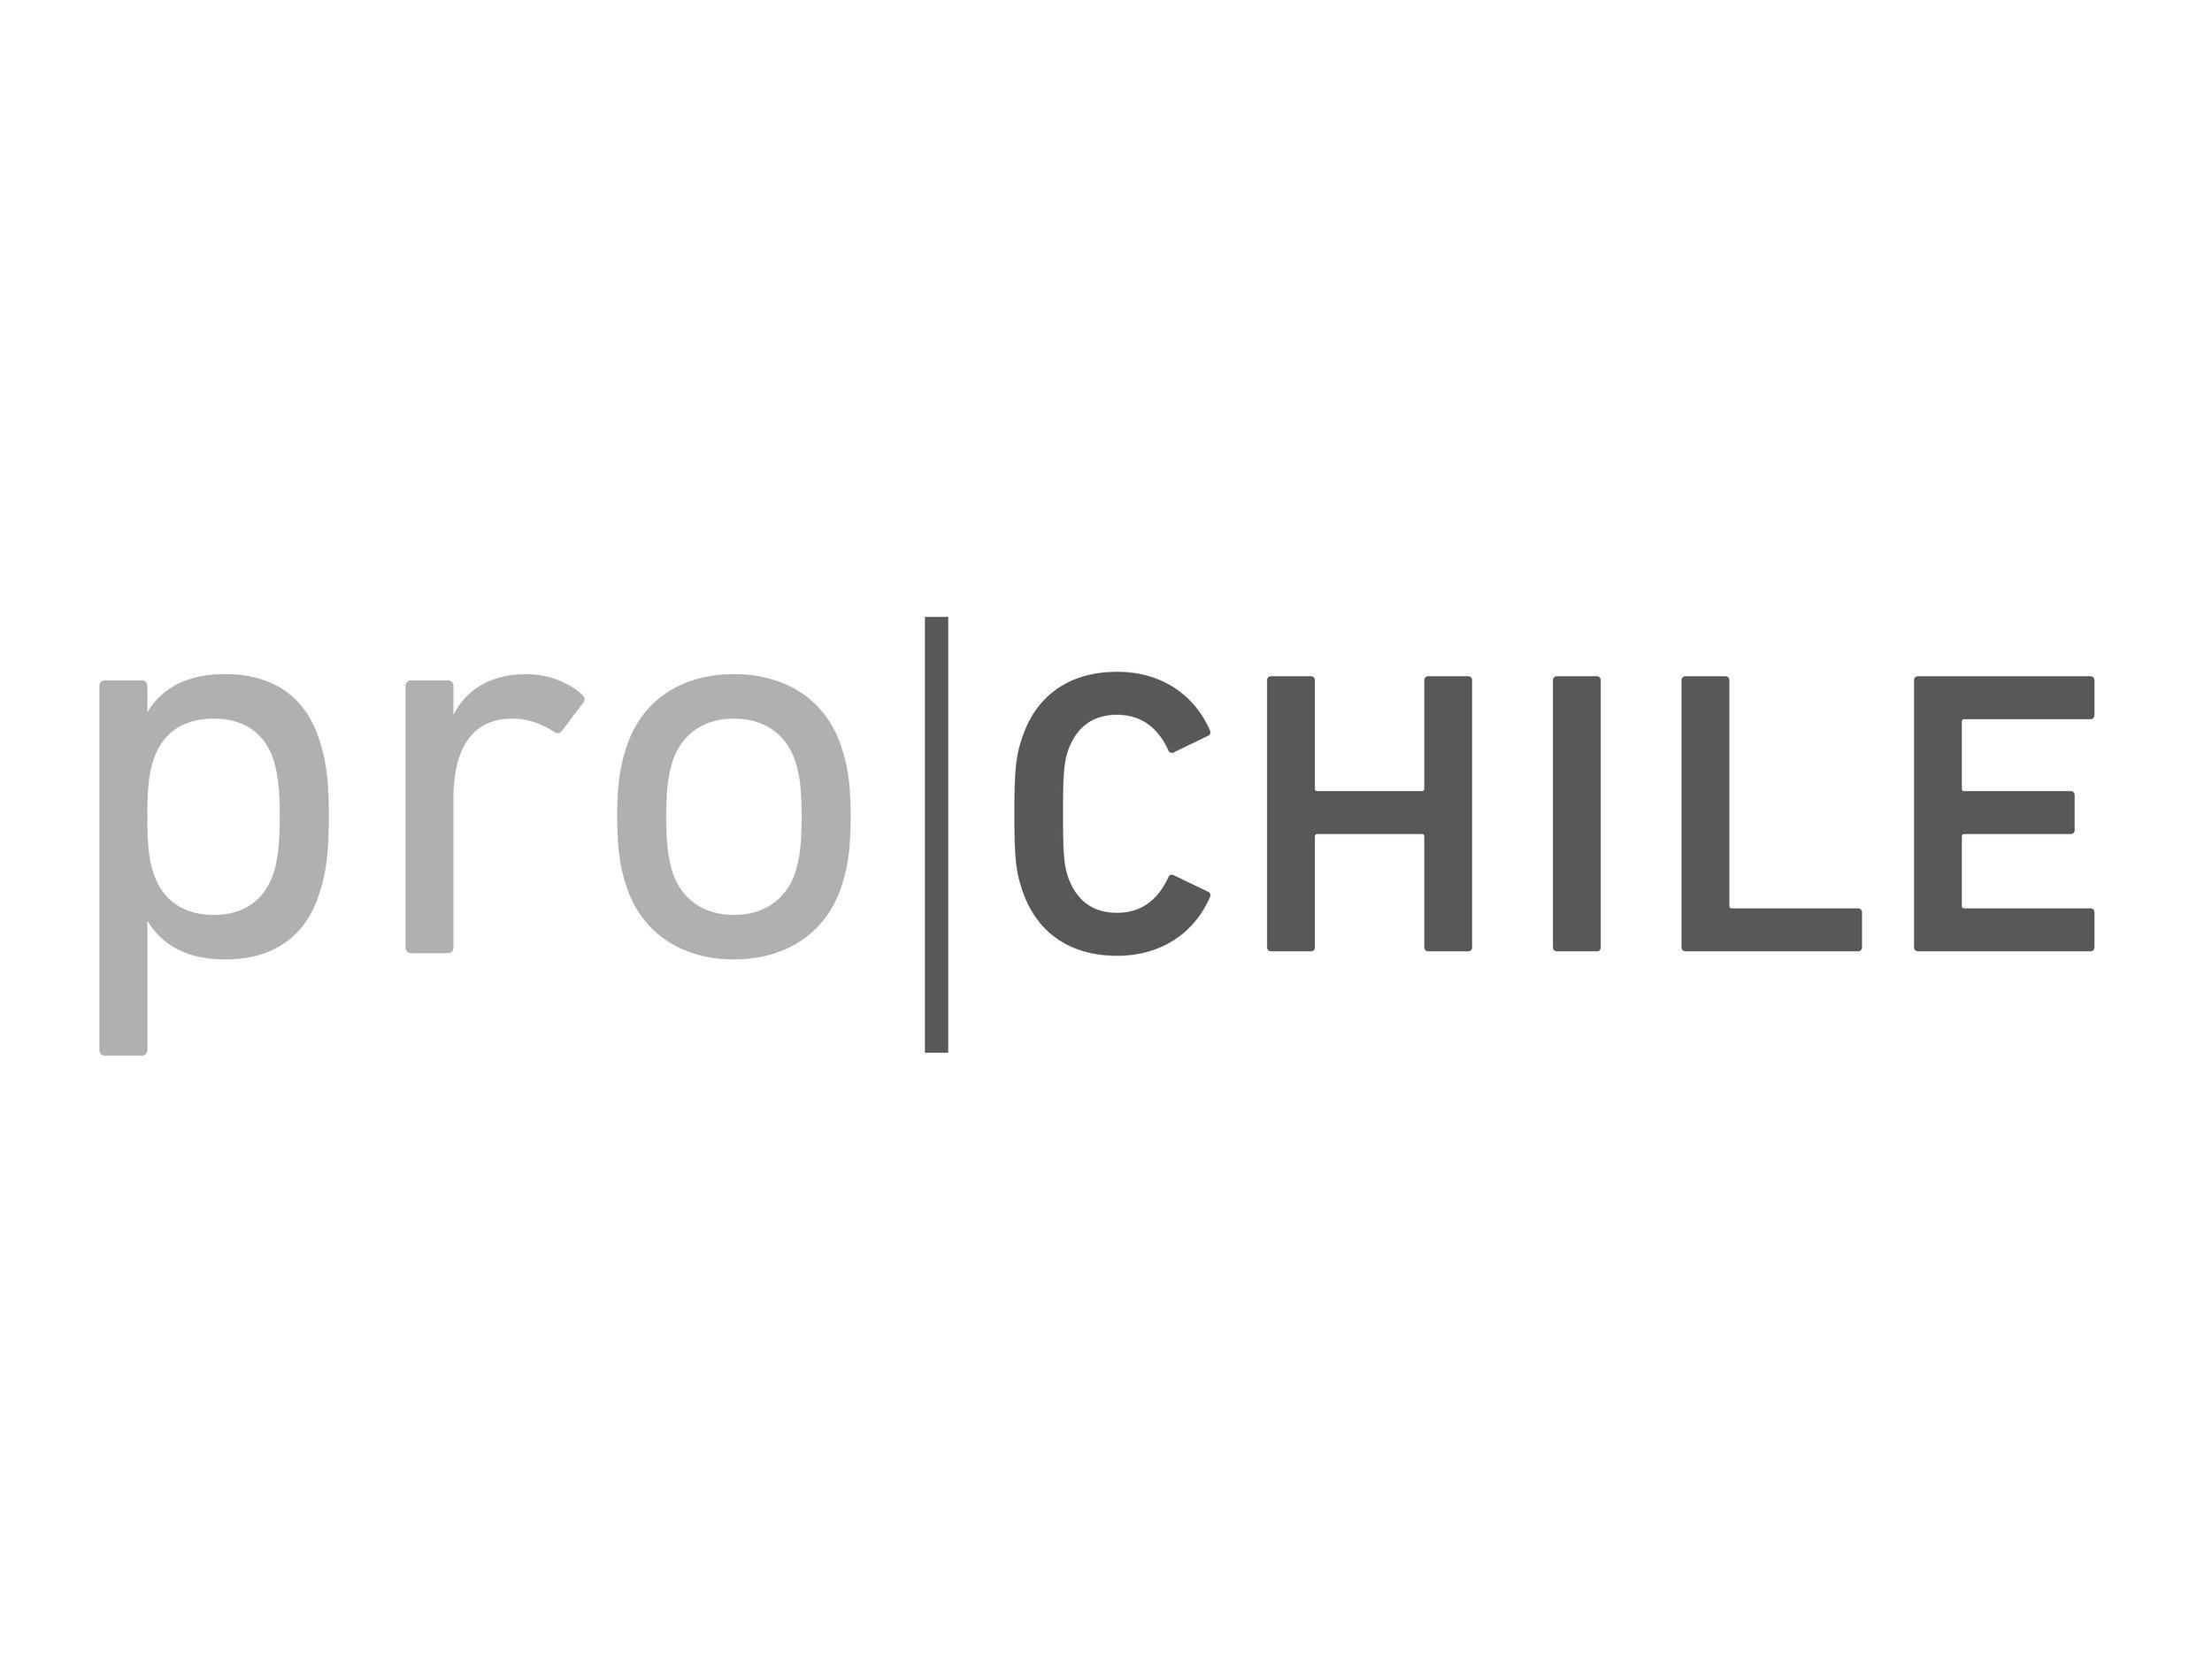 pro chile logo.jpg